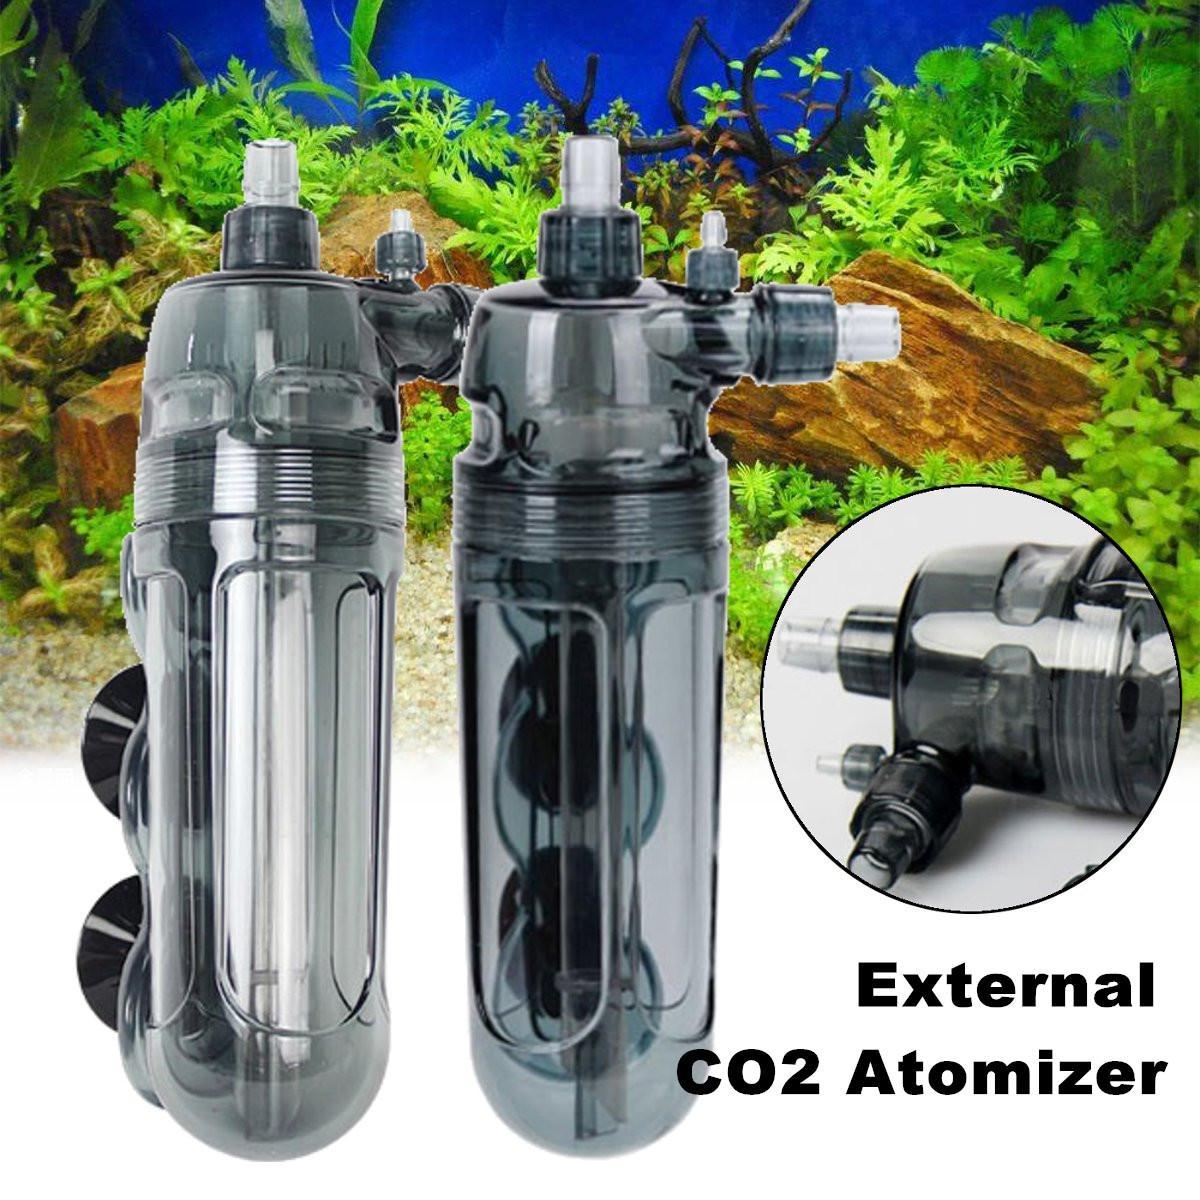 Aquarium Fish Tank External CO2 Atomizer Diffuser Fish Tank Atomizer Water Grass Plant Aquatic Carbon Dioxide Equipment Supply